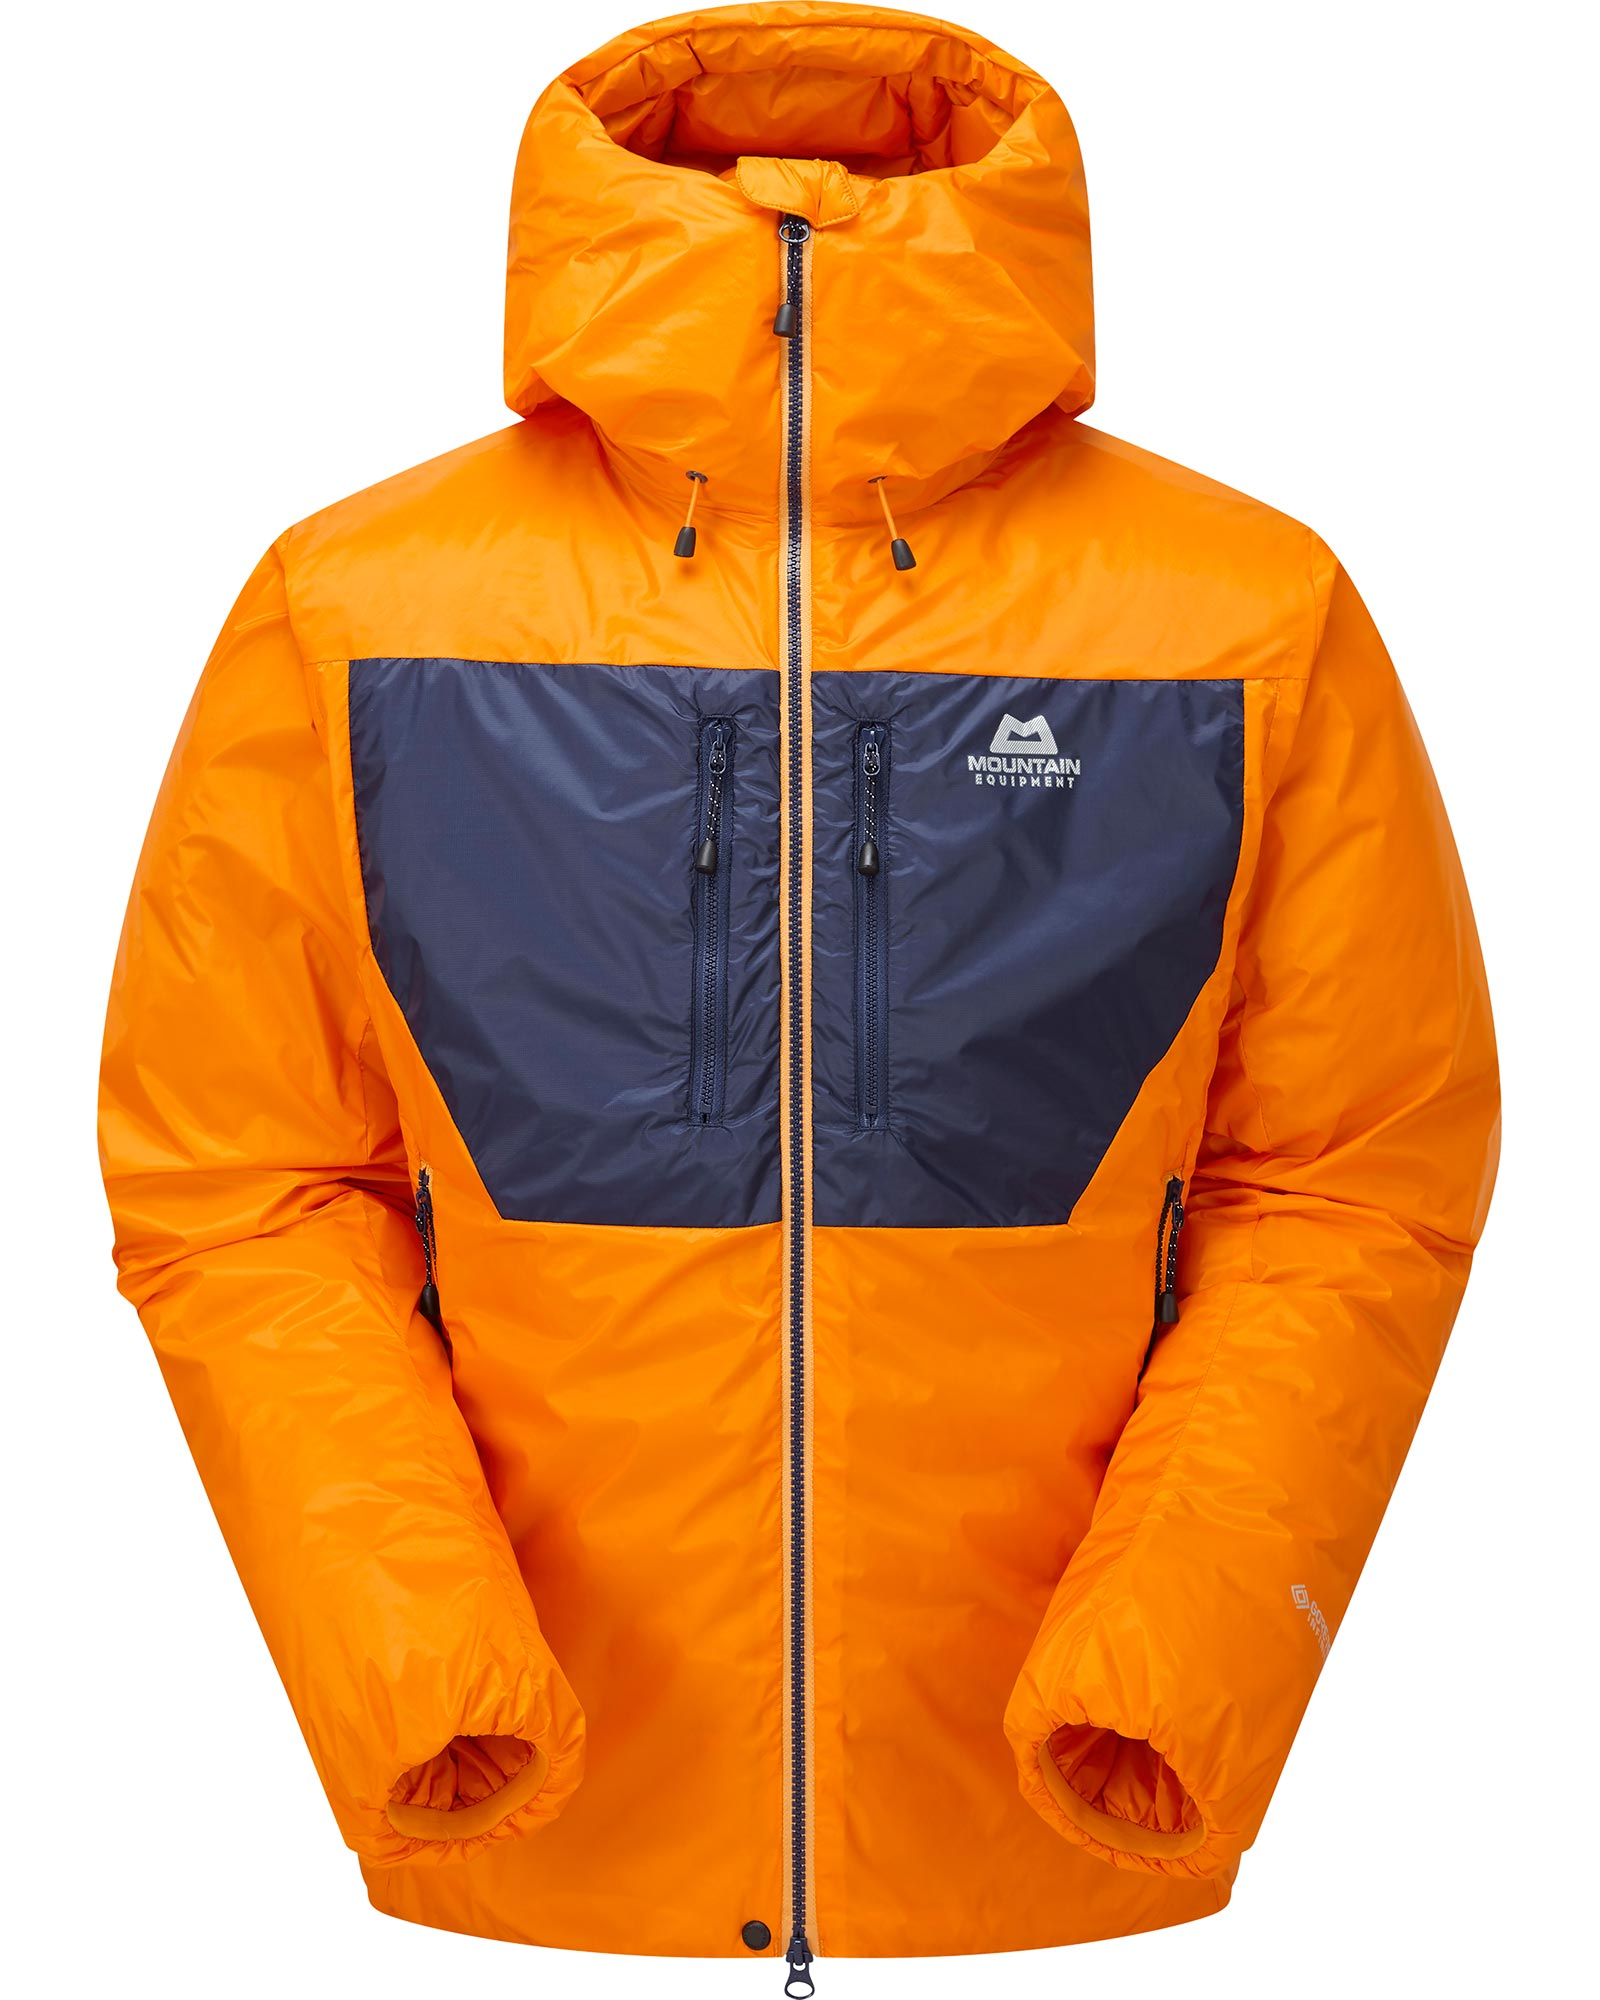 Mountain Equipment Kryos Men's Down Jacket 0